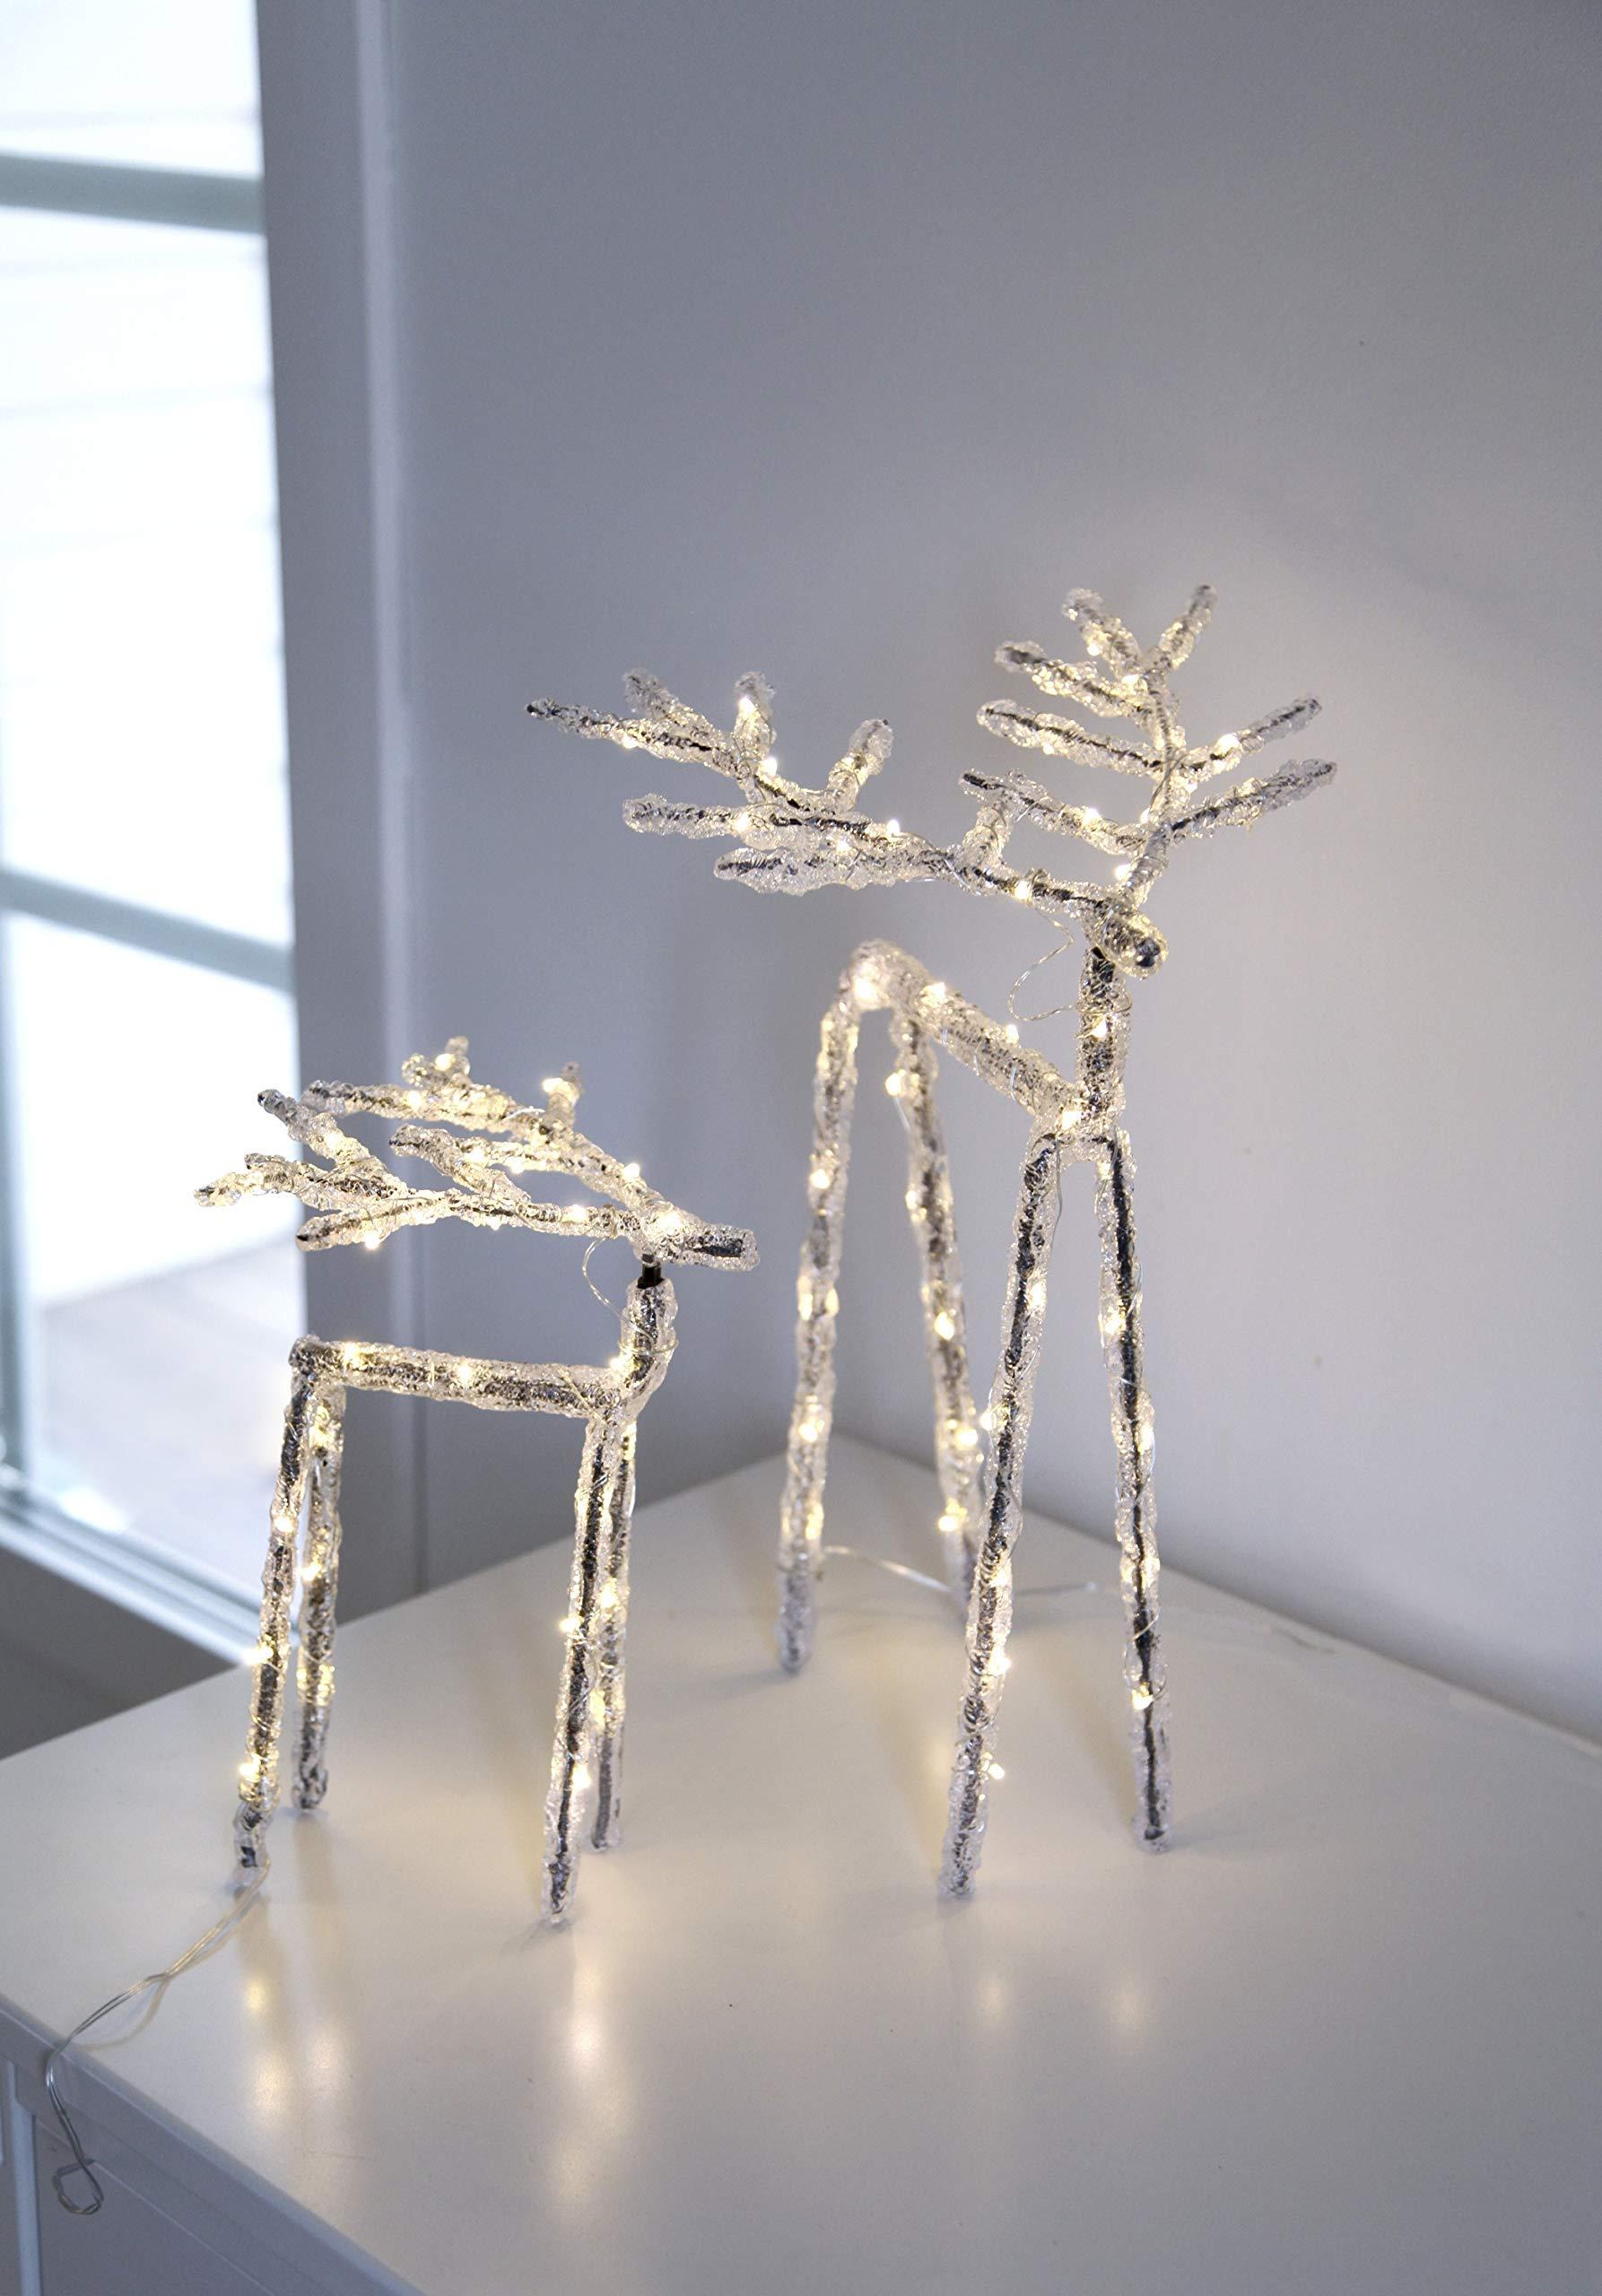 LED-Acryl-Design-Rentier-Icy-Deer-30-cool-white-LED-ca-20-x-20-cm-Timer-batteriebetrieben